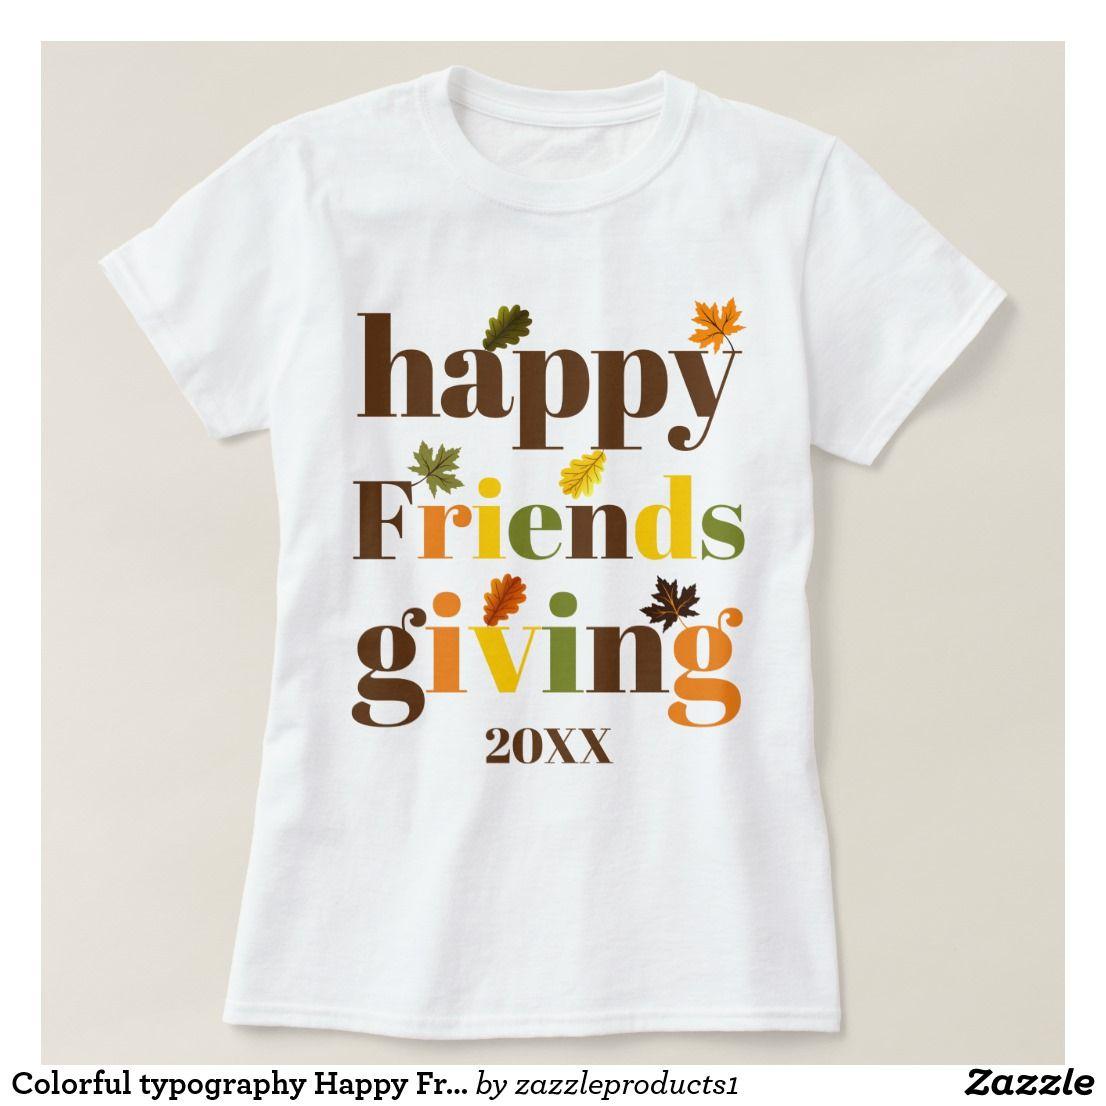 Colorful typography Happy Friendsgiving 2019 fall T-Shirt | Zazzle.com